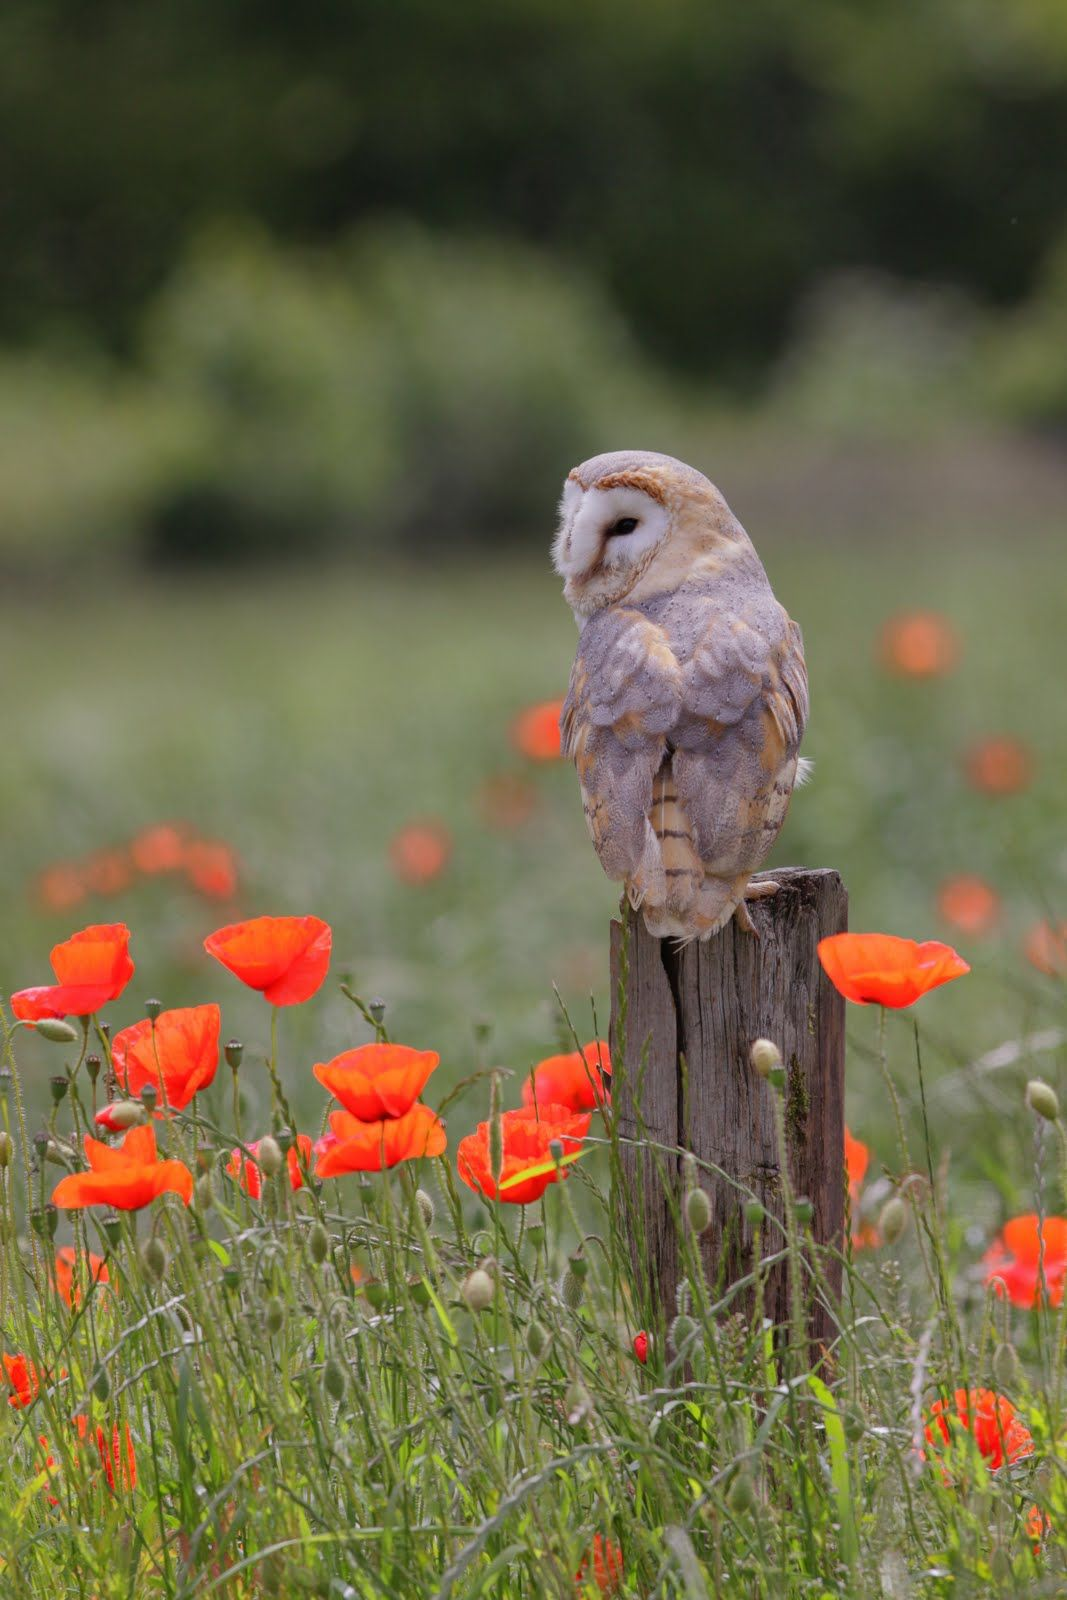 'Owl & Poppies' by Paul Hobson